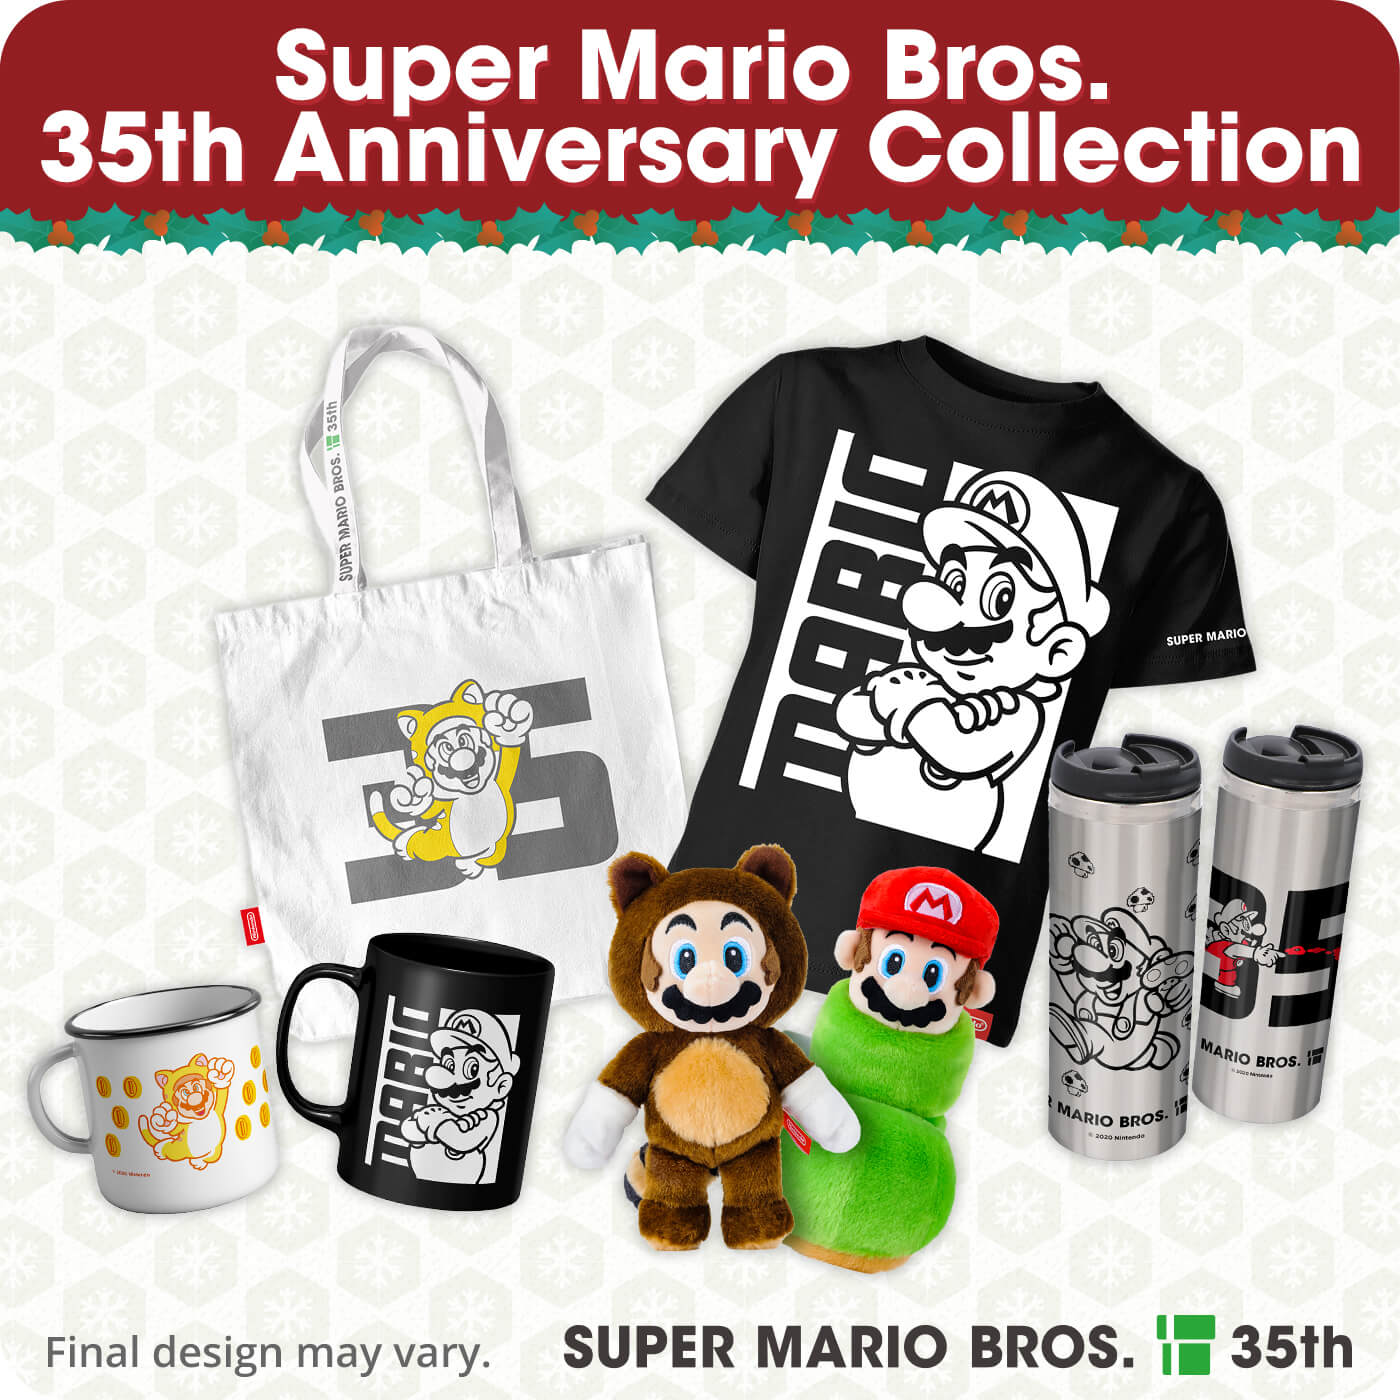 Super Mario Bros. 35th Anniversary merchandise